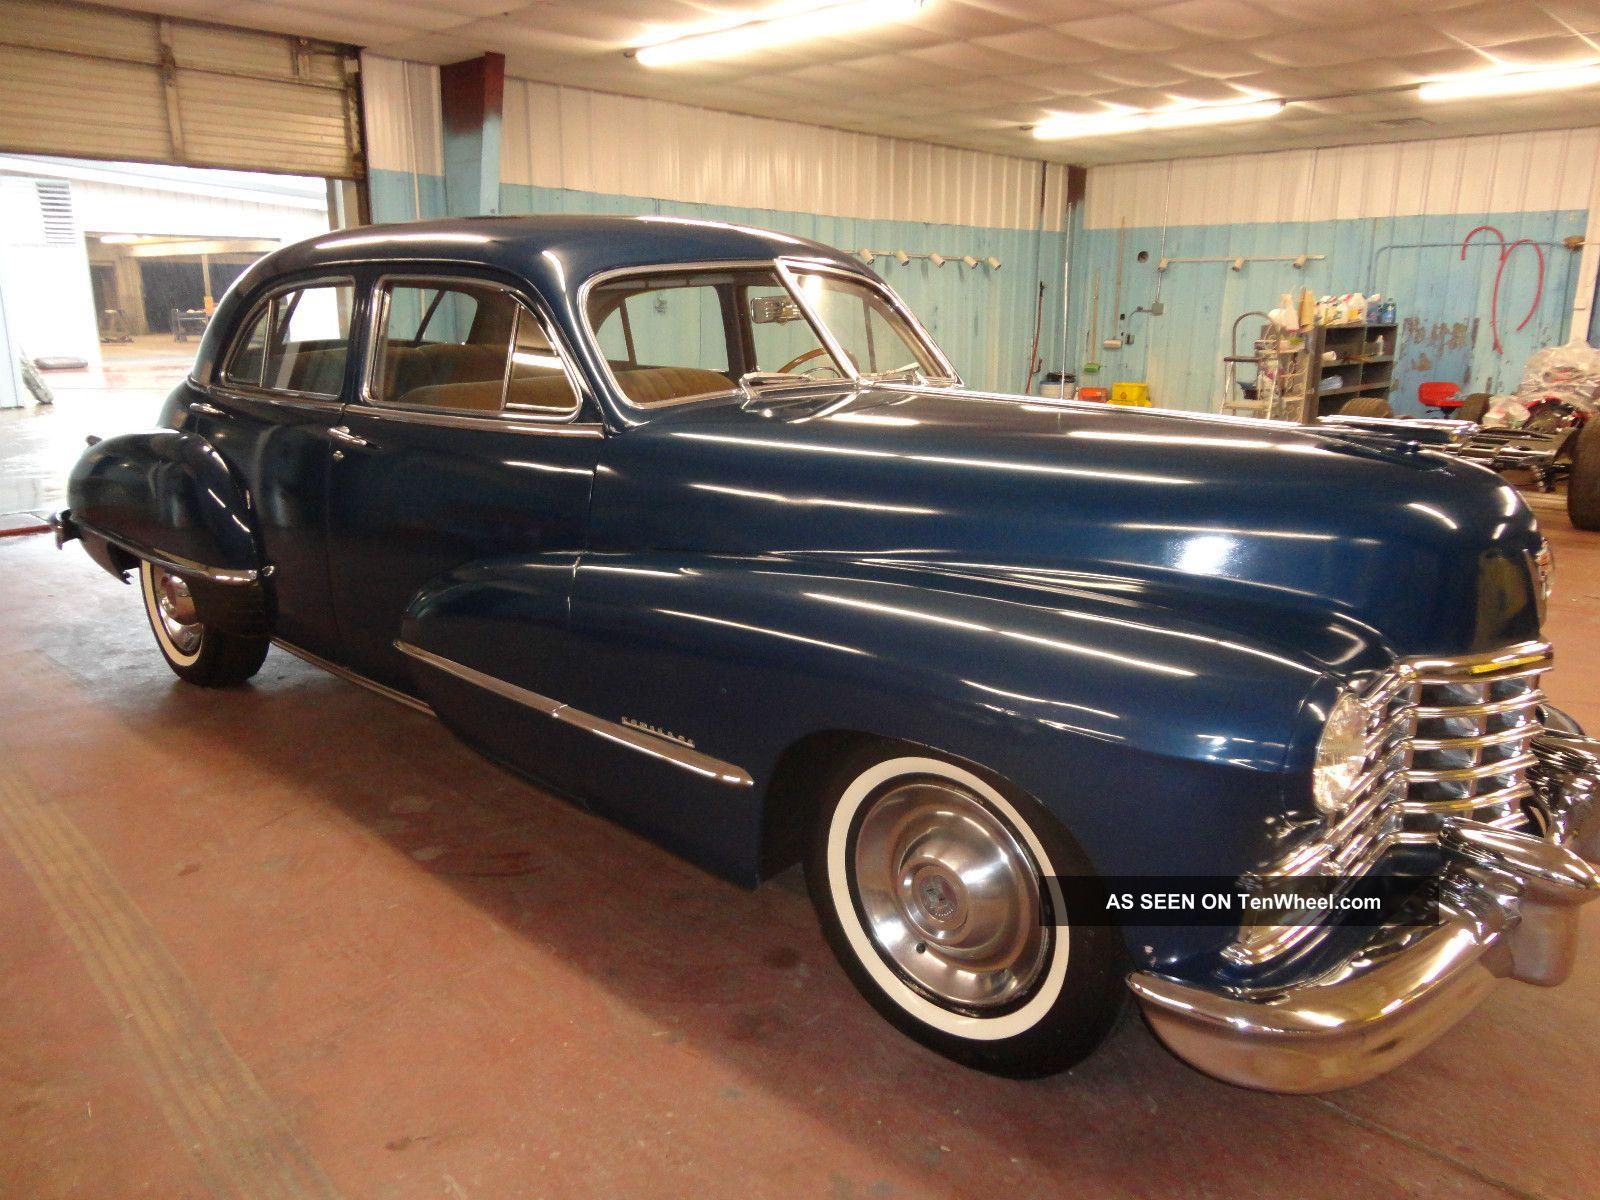 1946 Cadillac Series 62 4 Door  1946 Cadillac S...